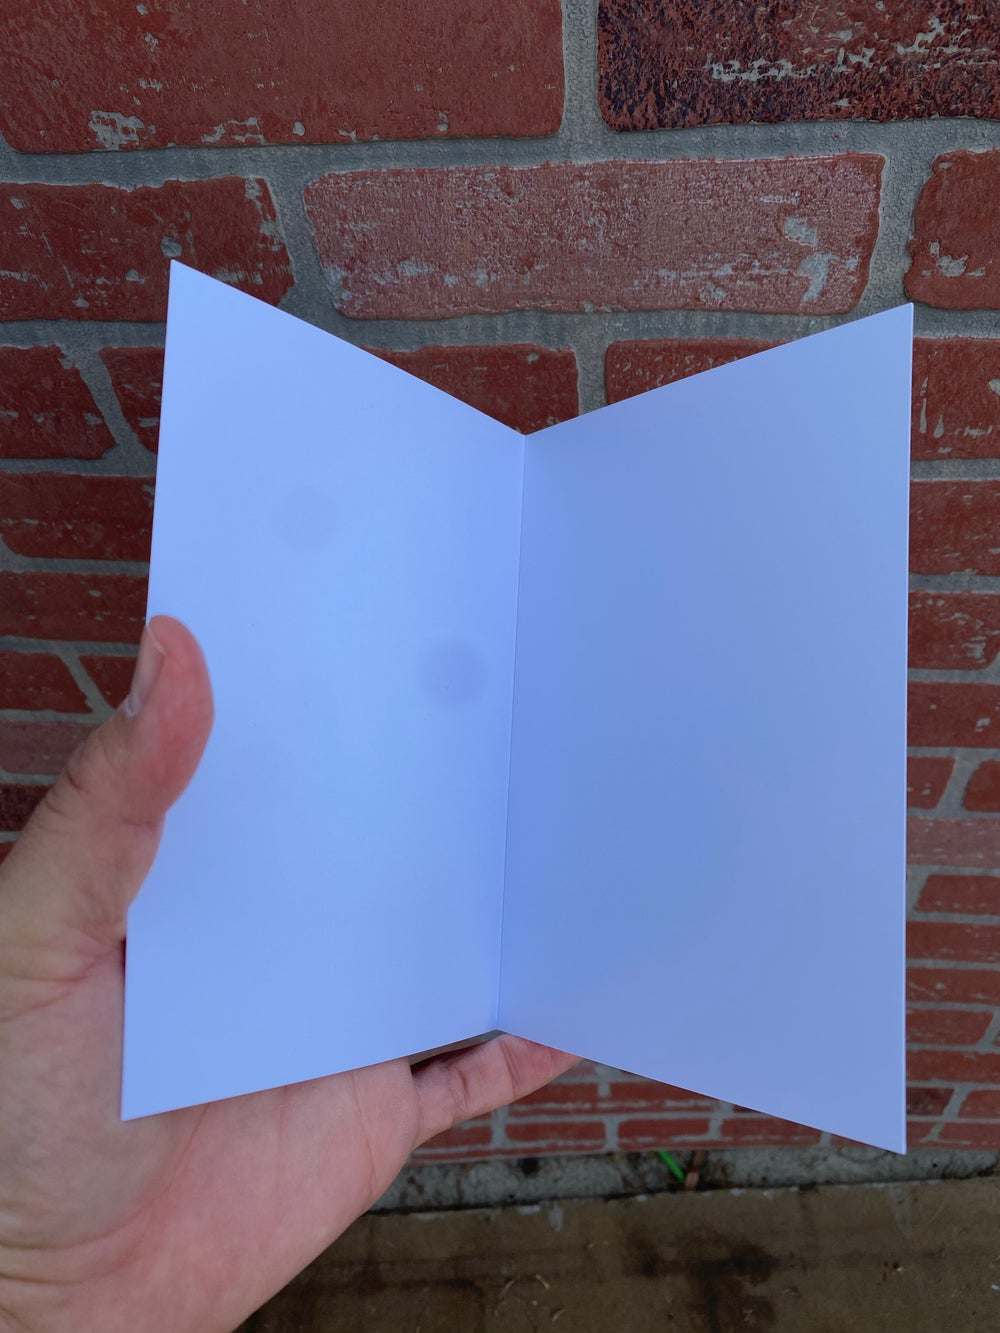 Ghosty Valloween Card